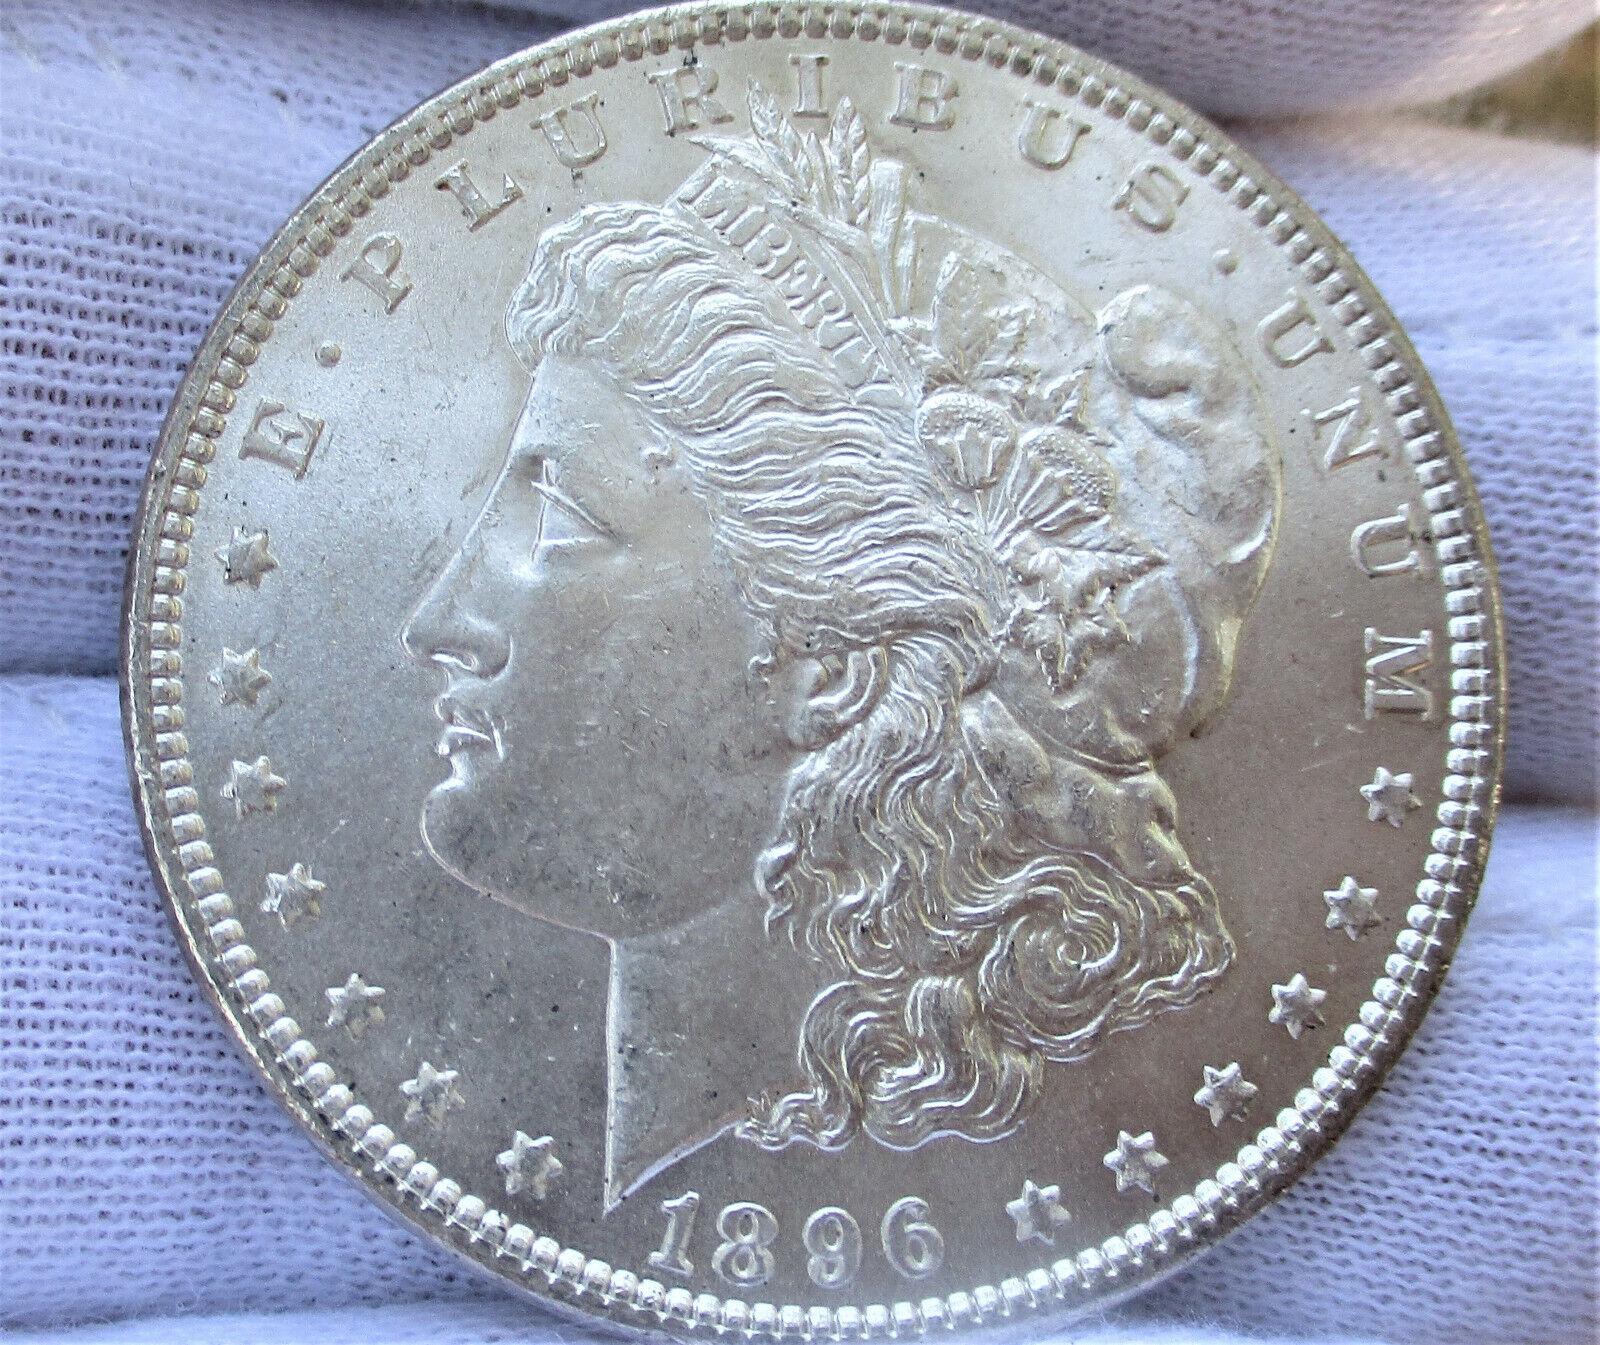 1896 MORGAN SILVER DOLLAR  - $59.99